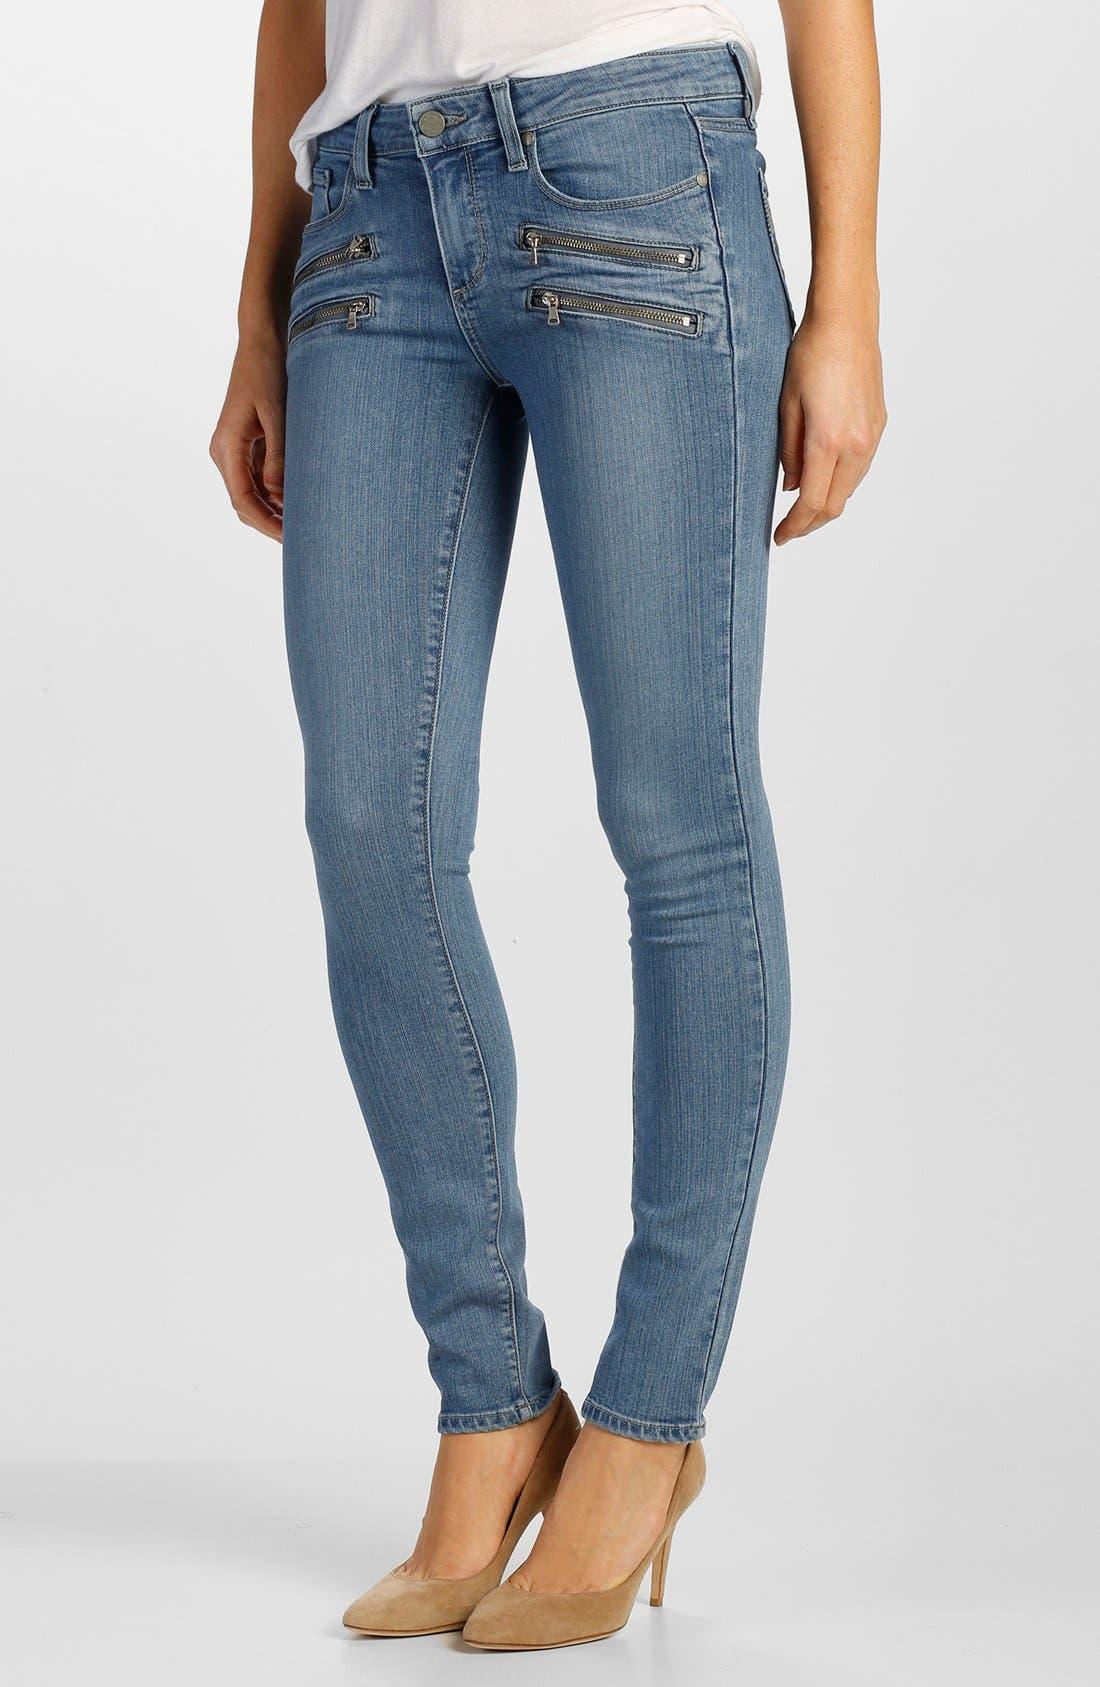 Main Image - Paige Denim 'Transcend - Edgemont' Ultra Skinny Jeans (Joelle No Whiskers)